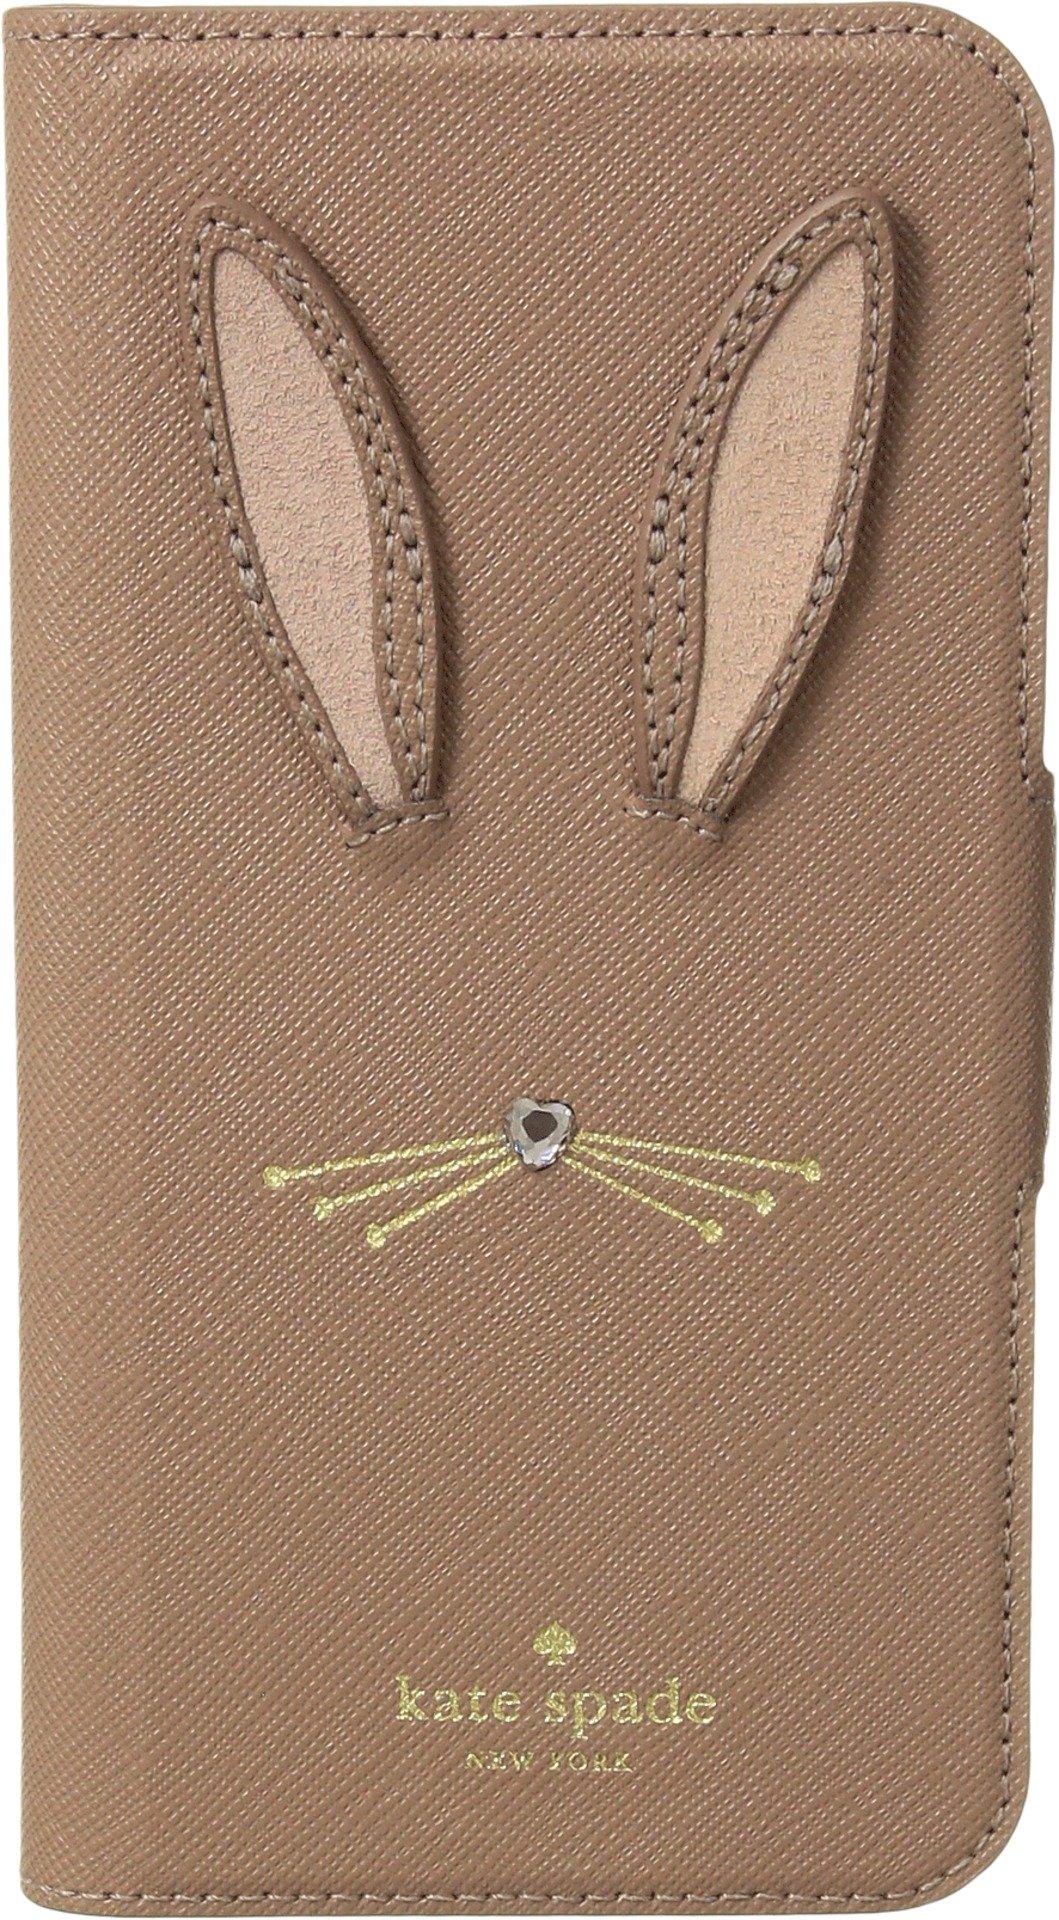 Kate Spade New York Women's Rabbit Applique Folio Phone Case for iPhone X Tan Multi One Size